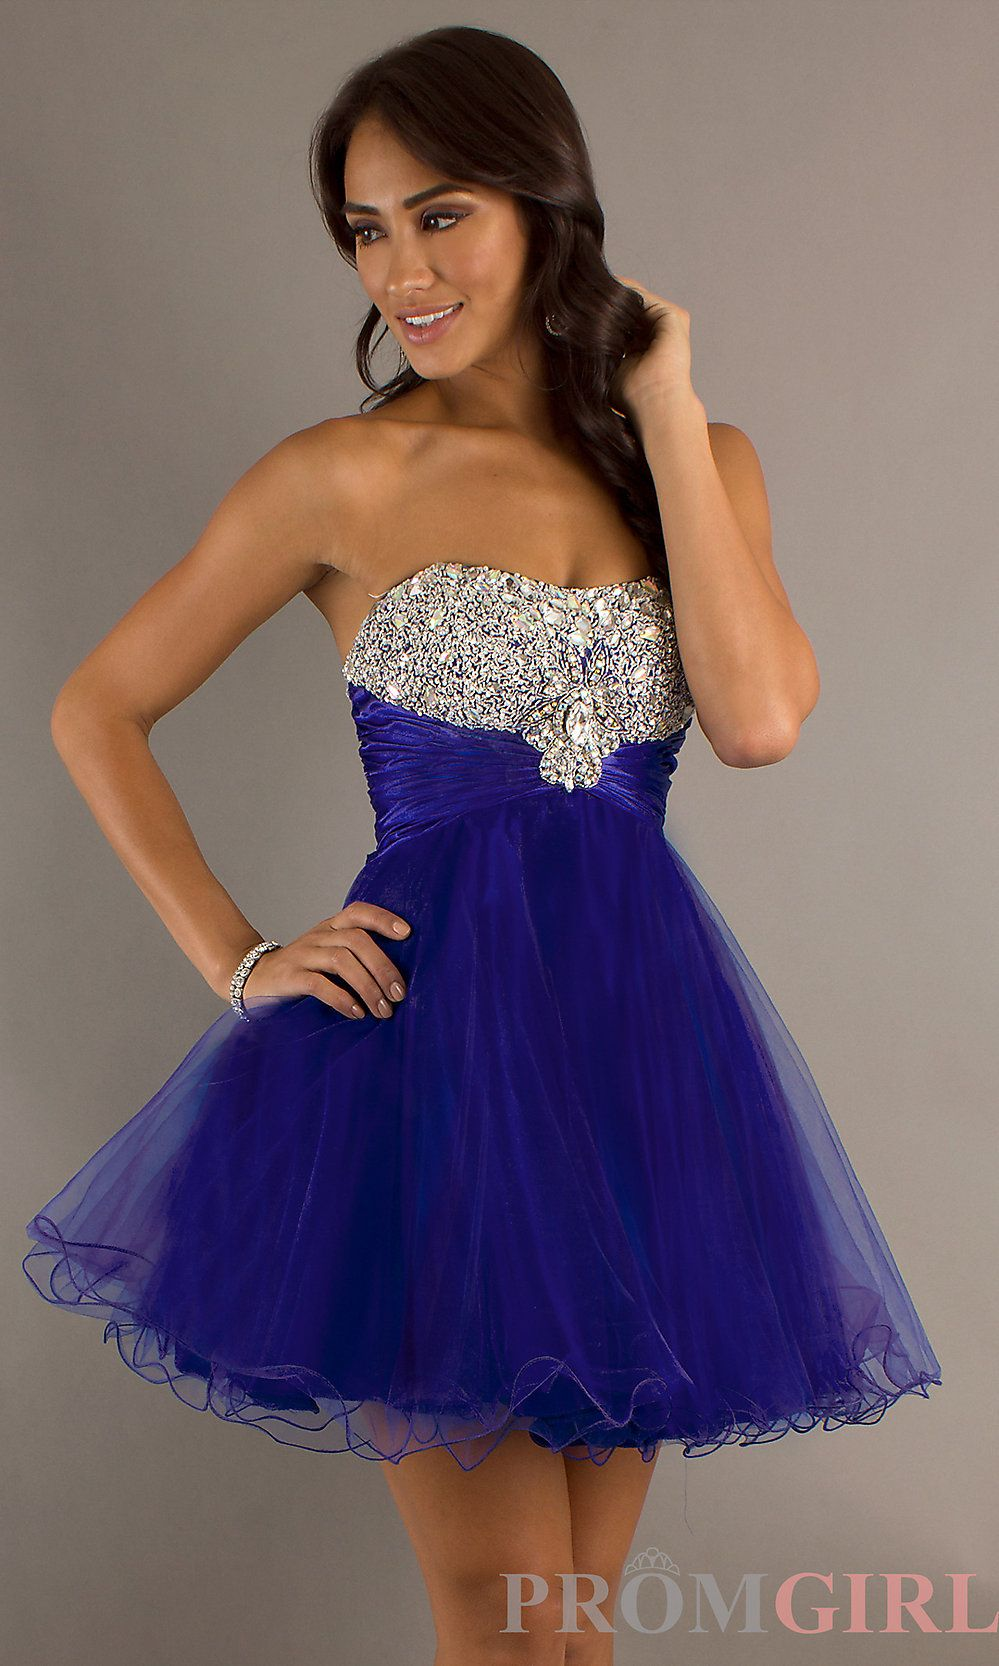 Juniors Short Party Dresses | Strapless Party Dress, Junior Short ...